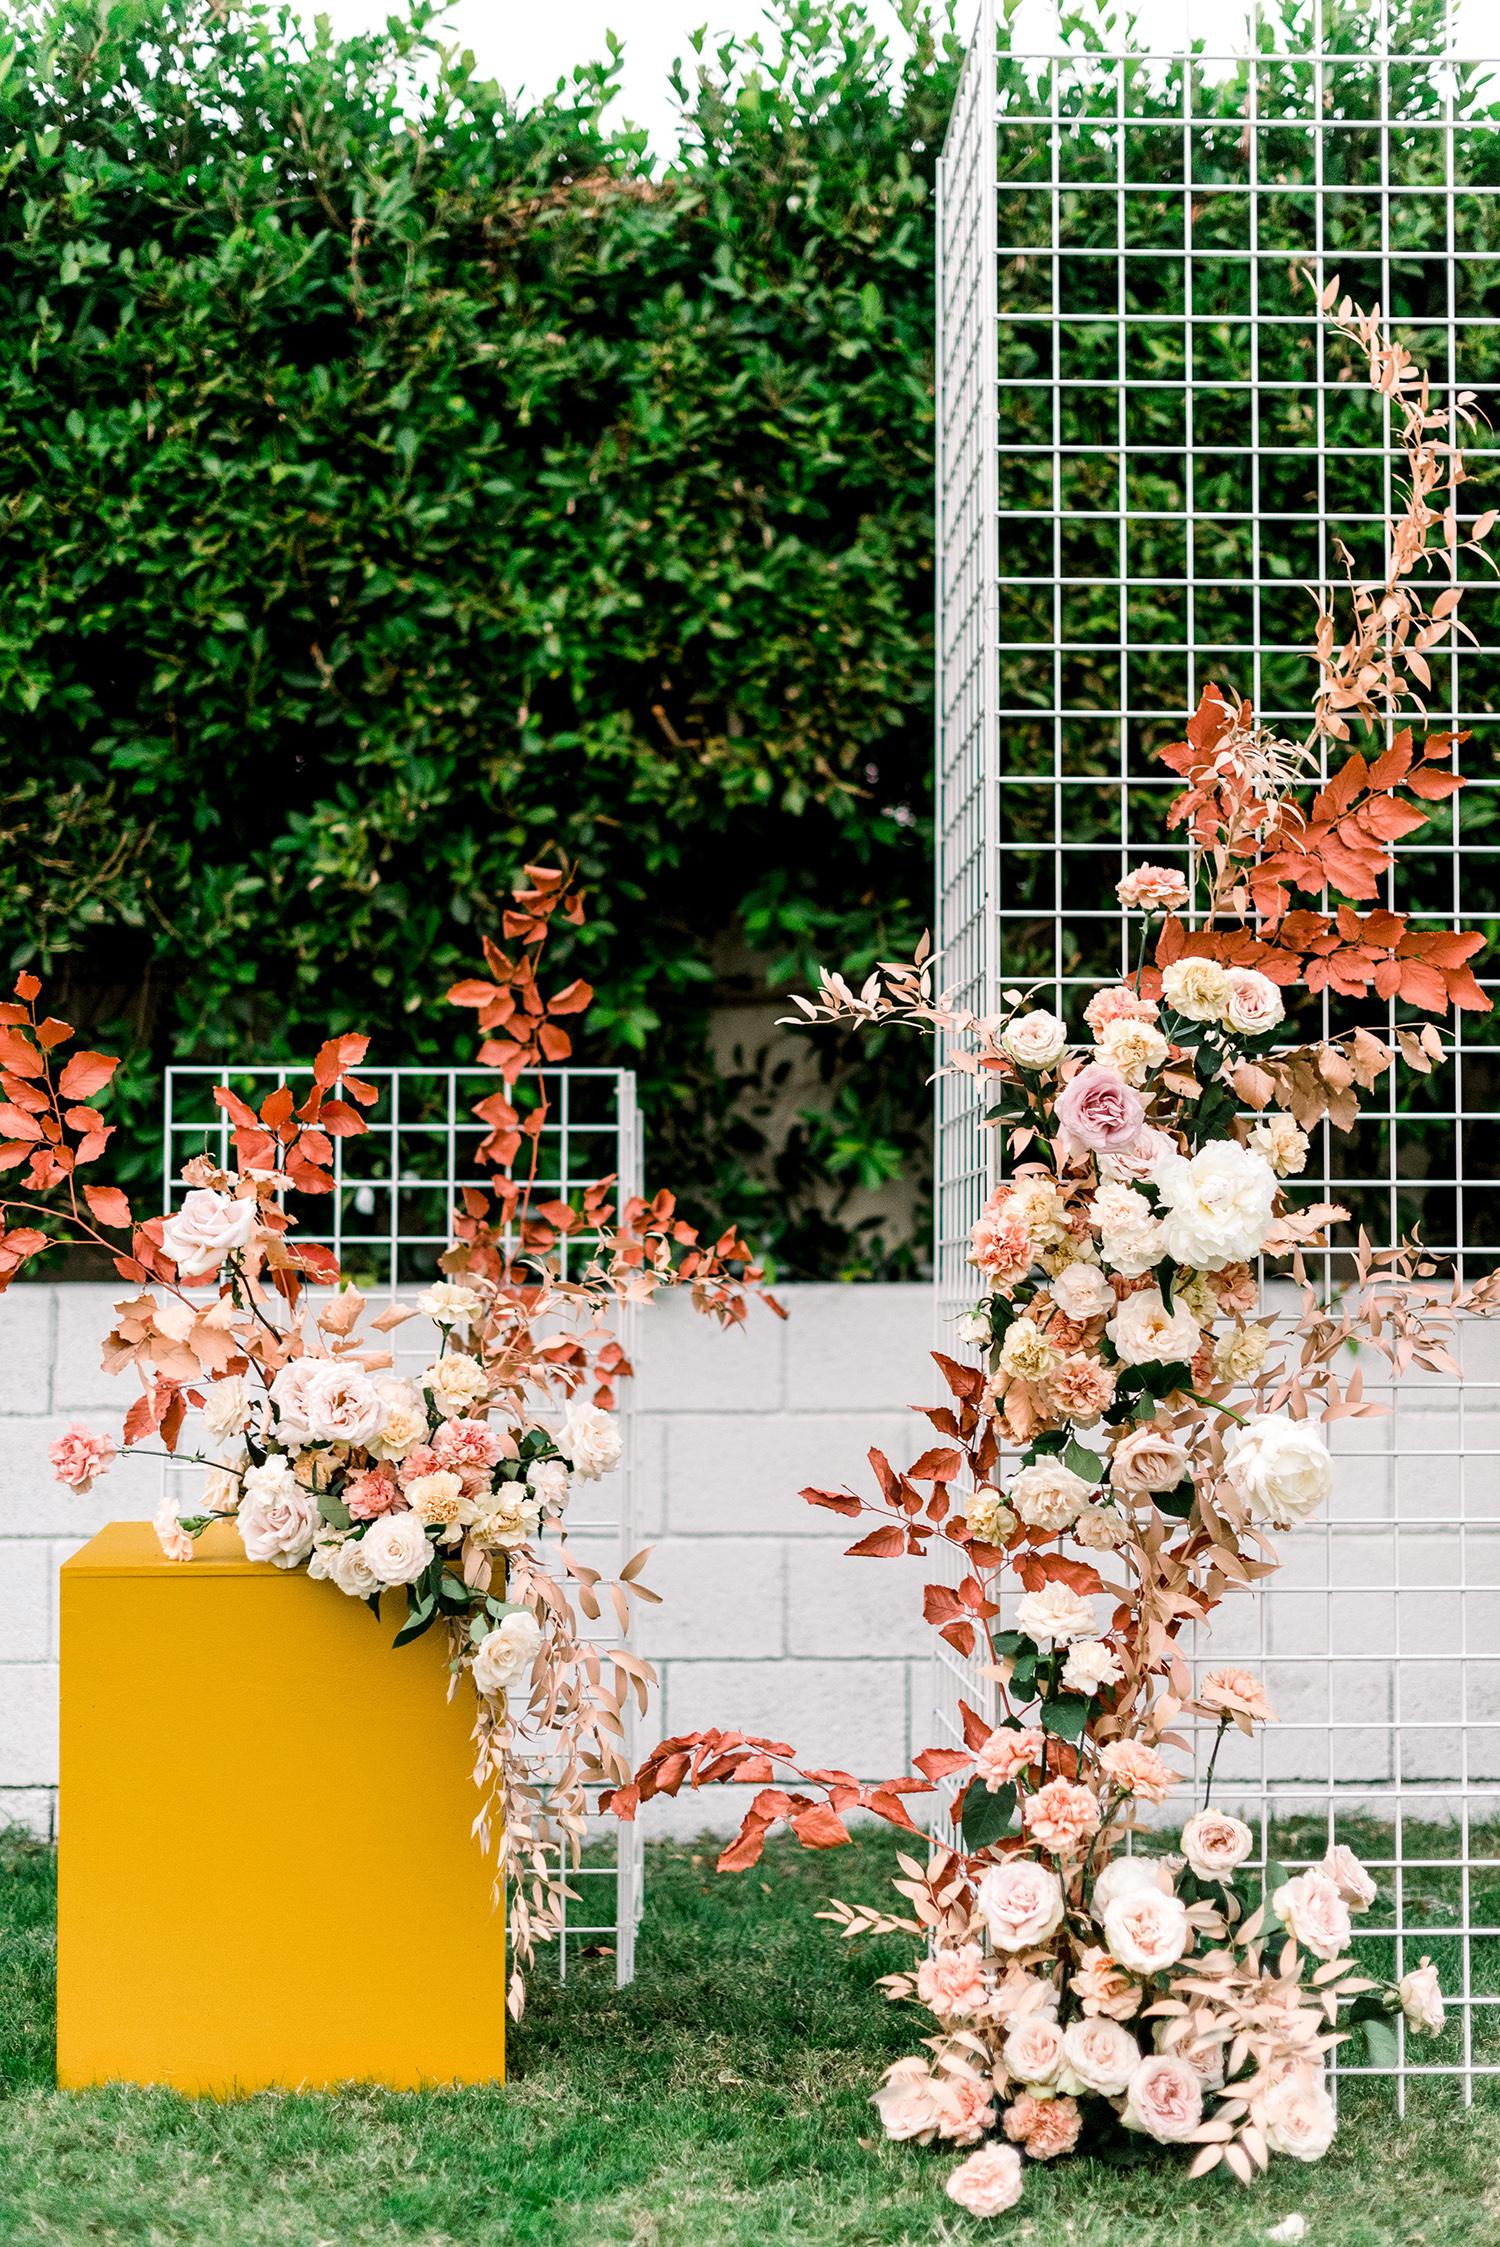 hanna will wedding outdoor ceremony backdrop